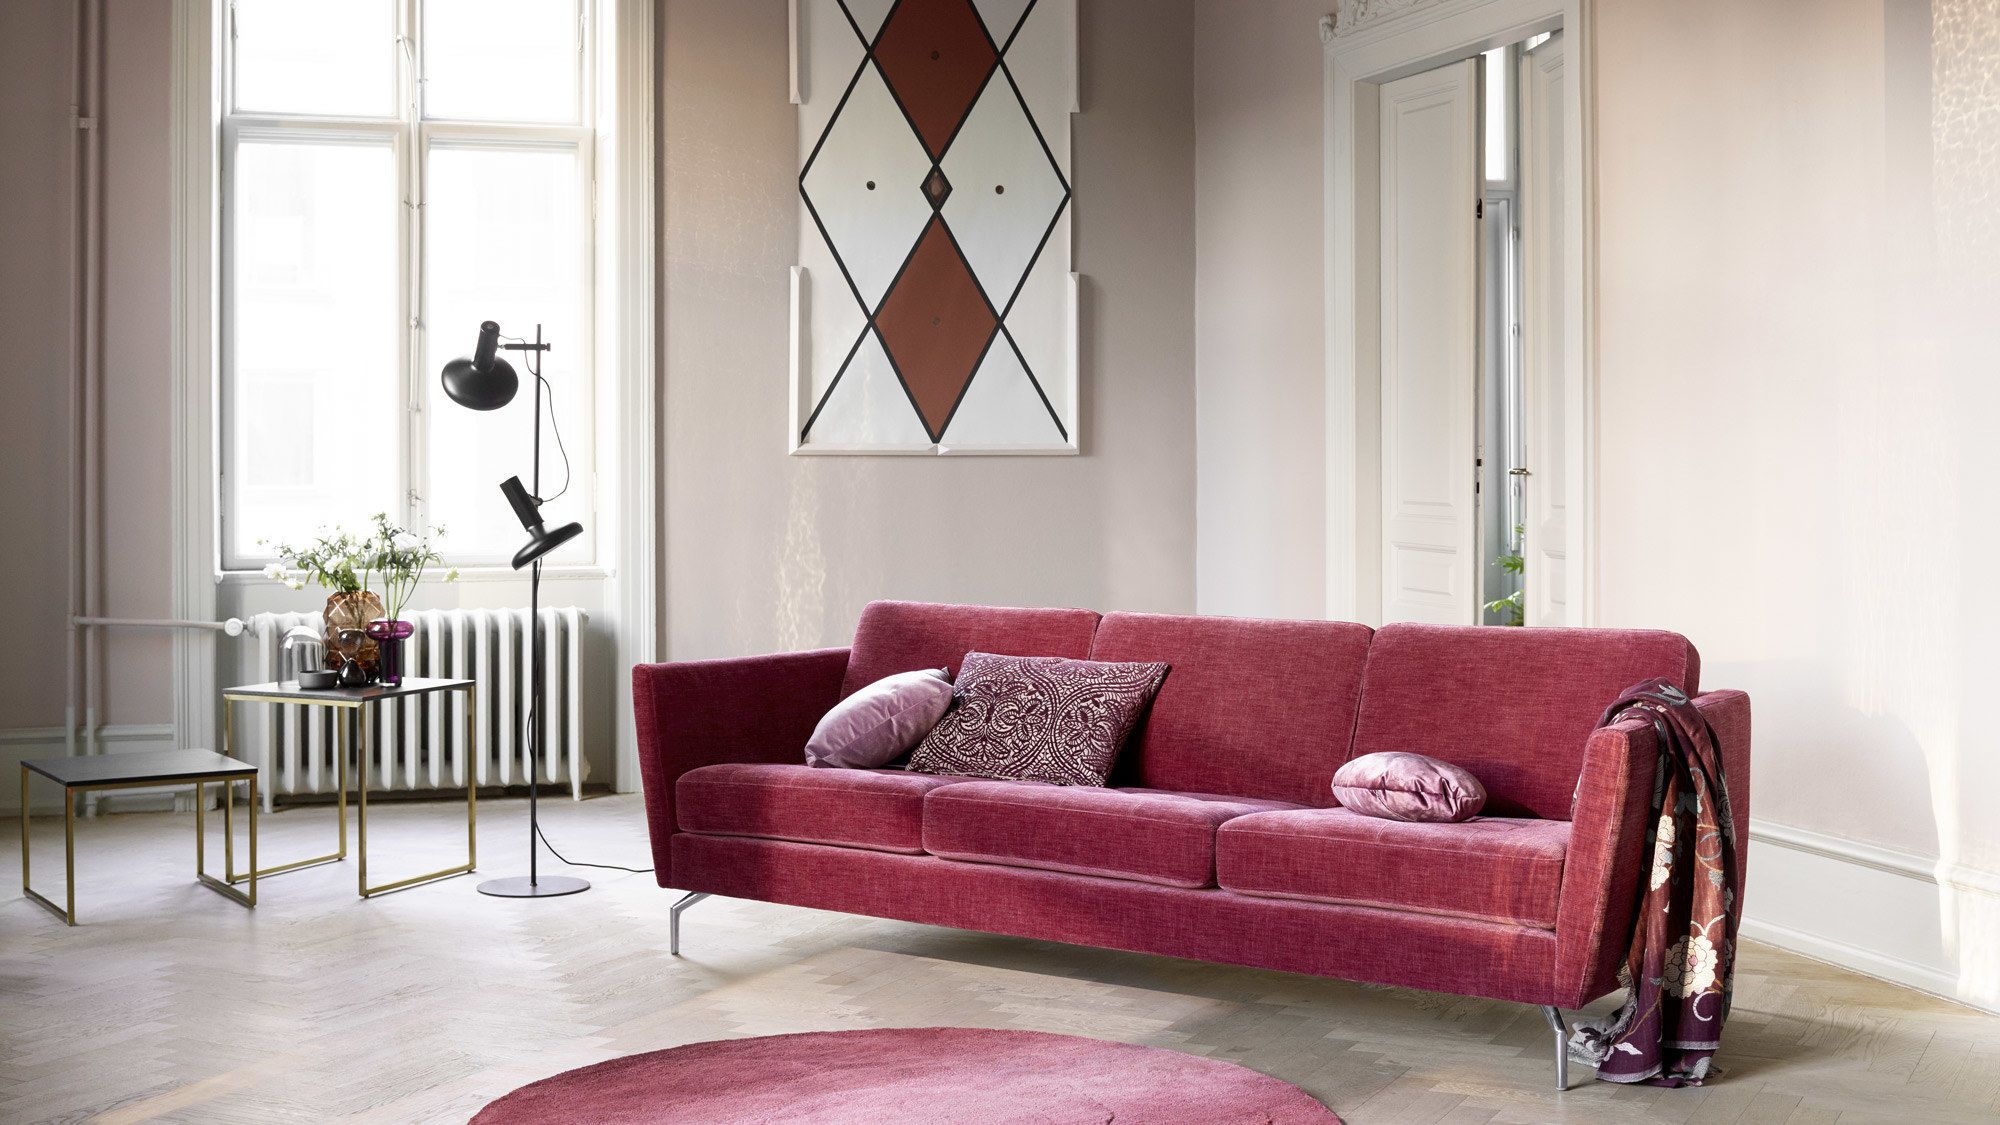 Osaka Sofa Tufted Seat Scandinavian Furniture Design Modular Sofa Design Furniture Design